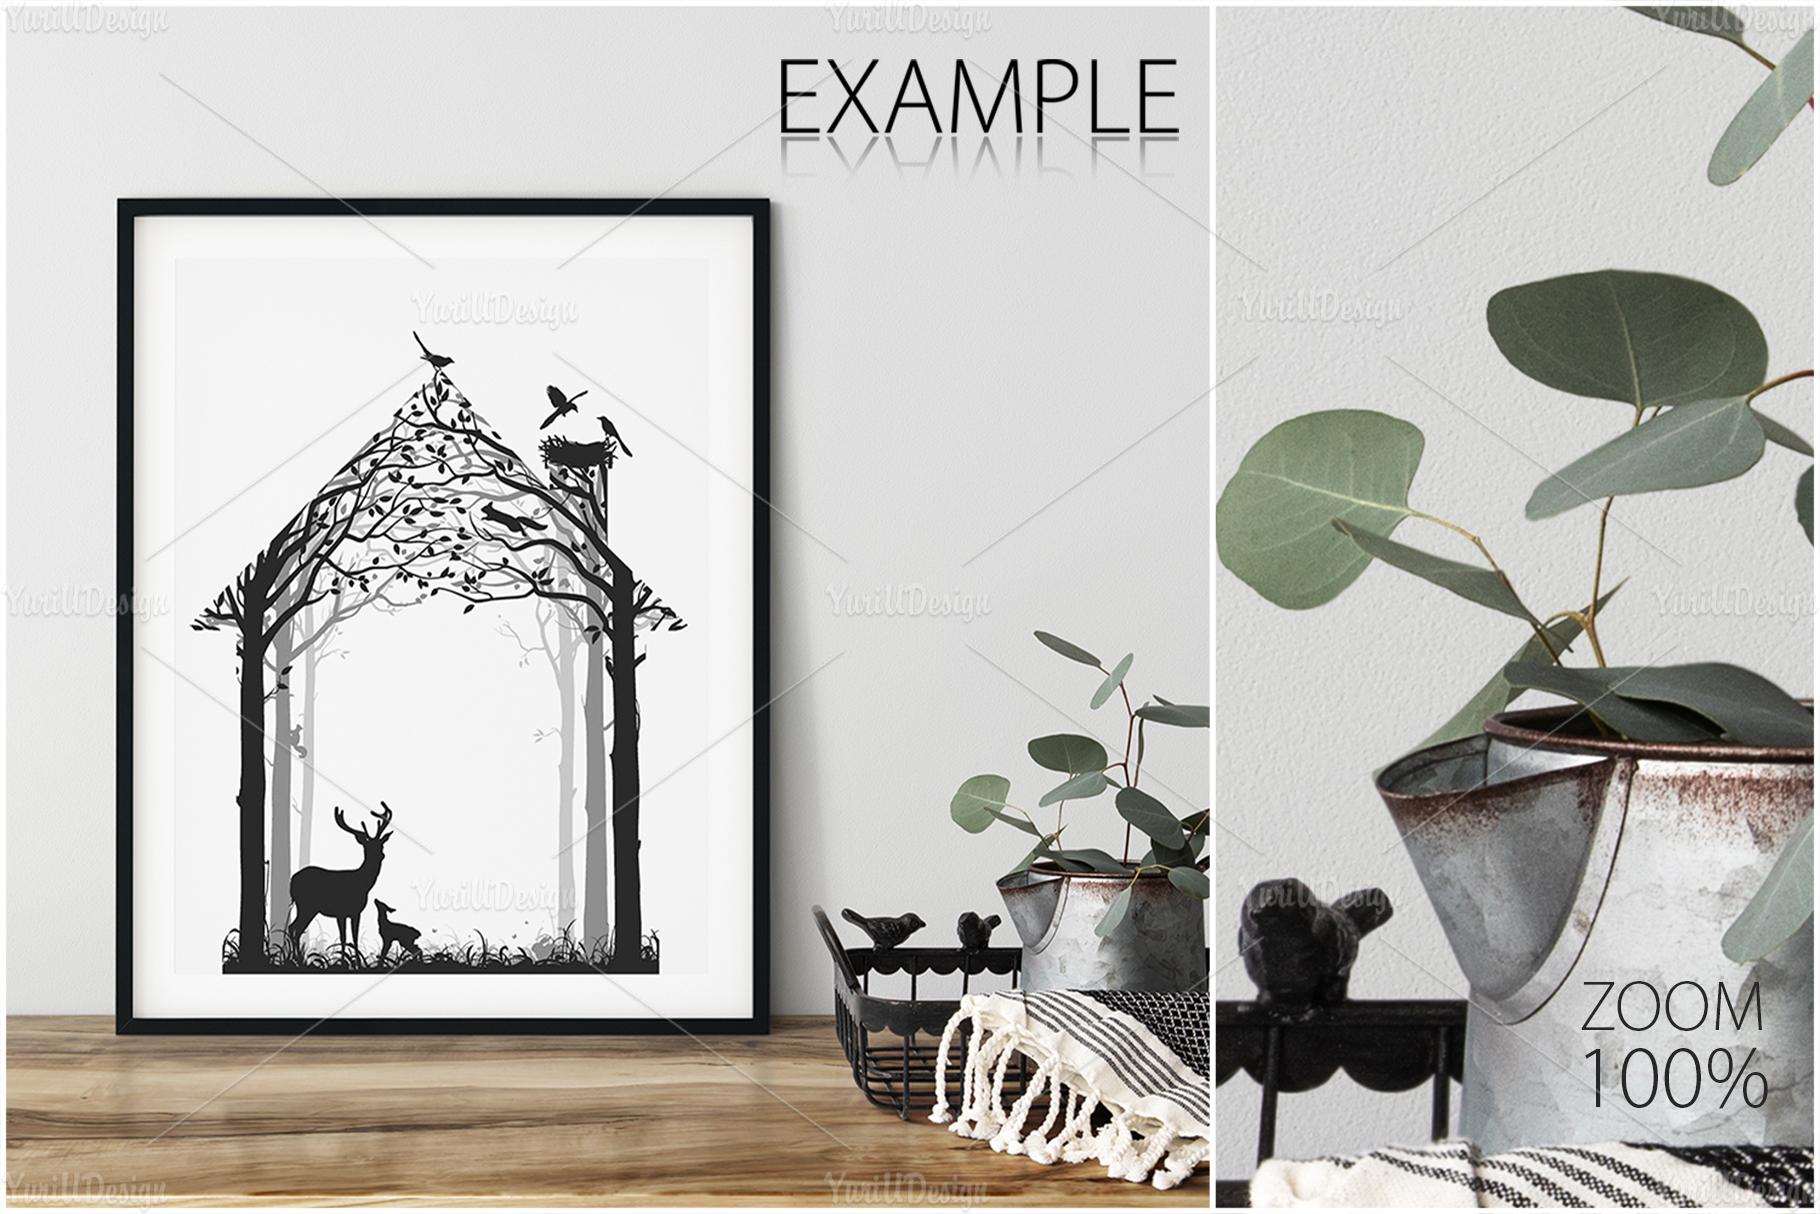 Scandinavian Interior Frames & Walls Mockup Bundle - 3 example image 25